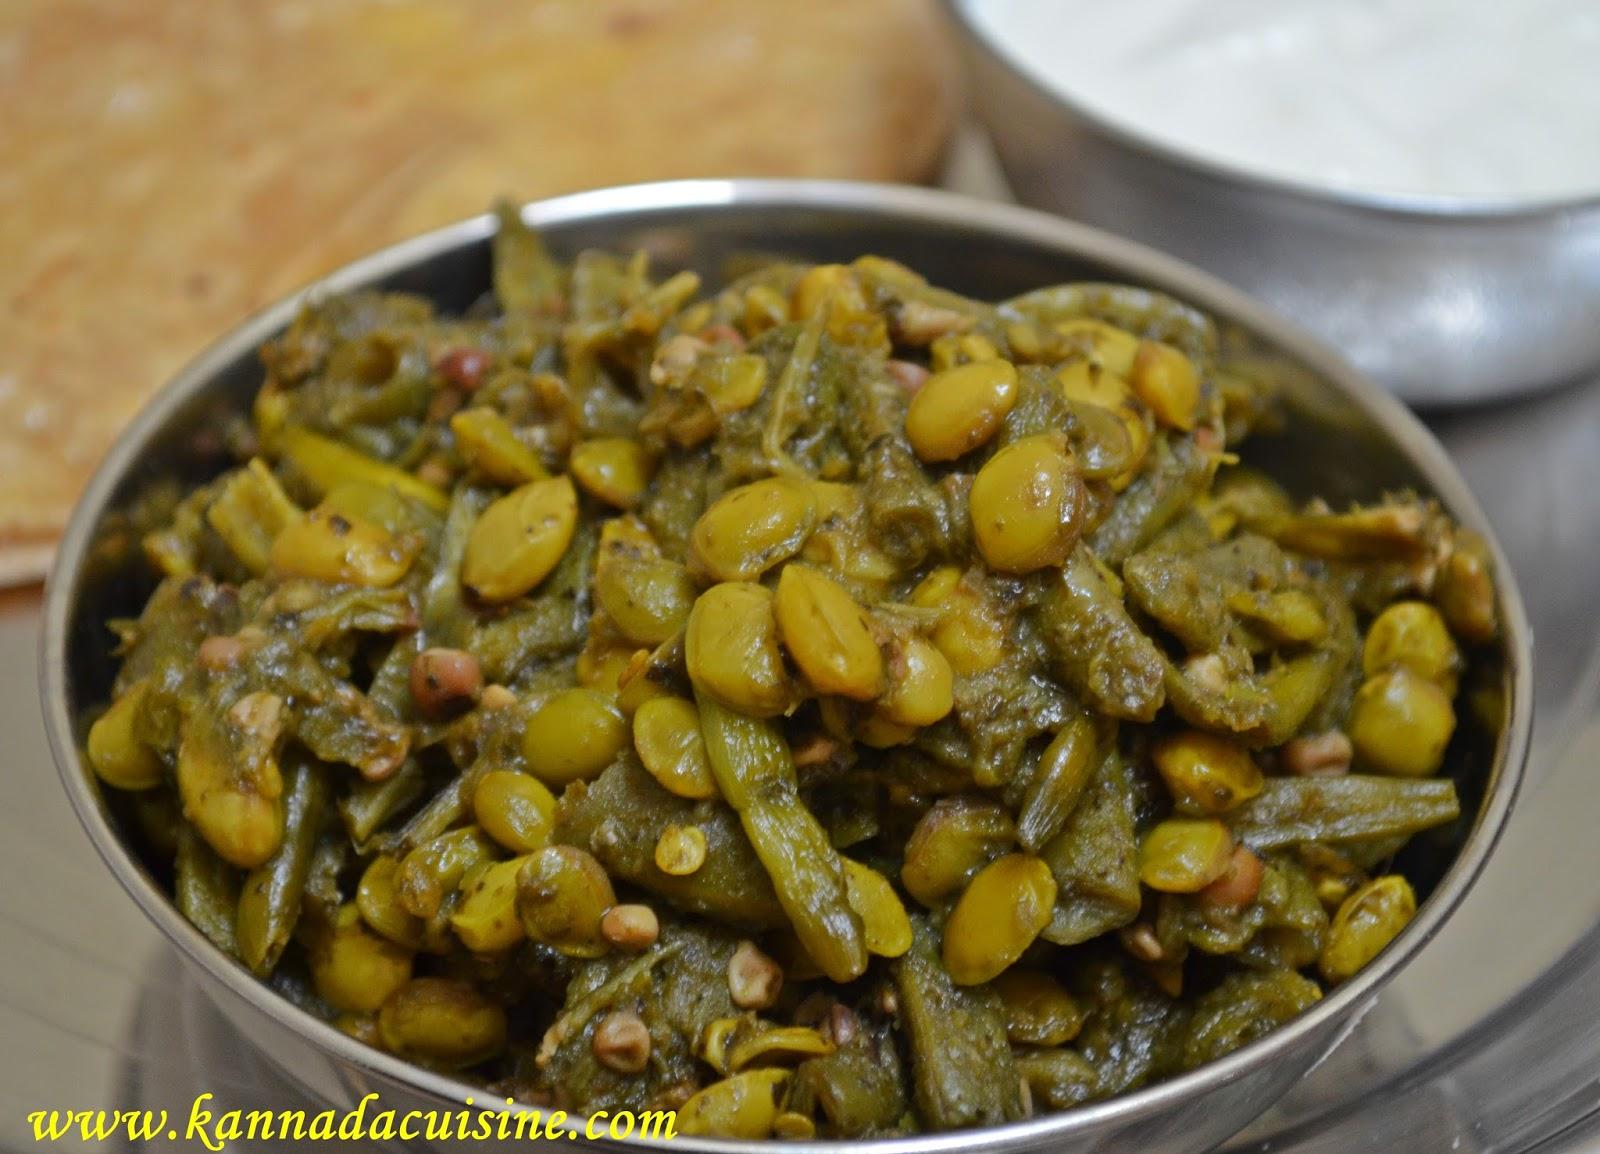 Kannada cuisine tender green vegetables in green masala forumfinder Choice Image